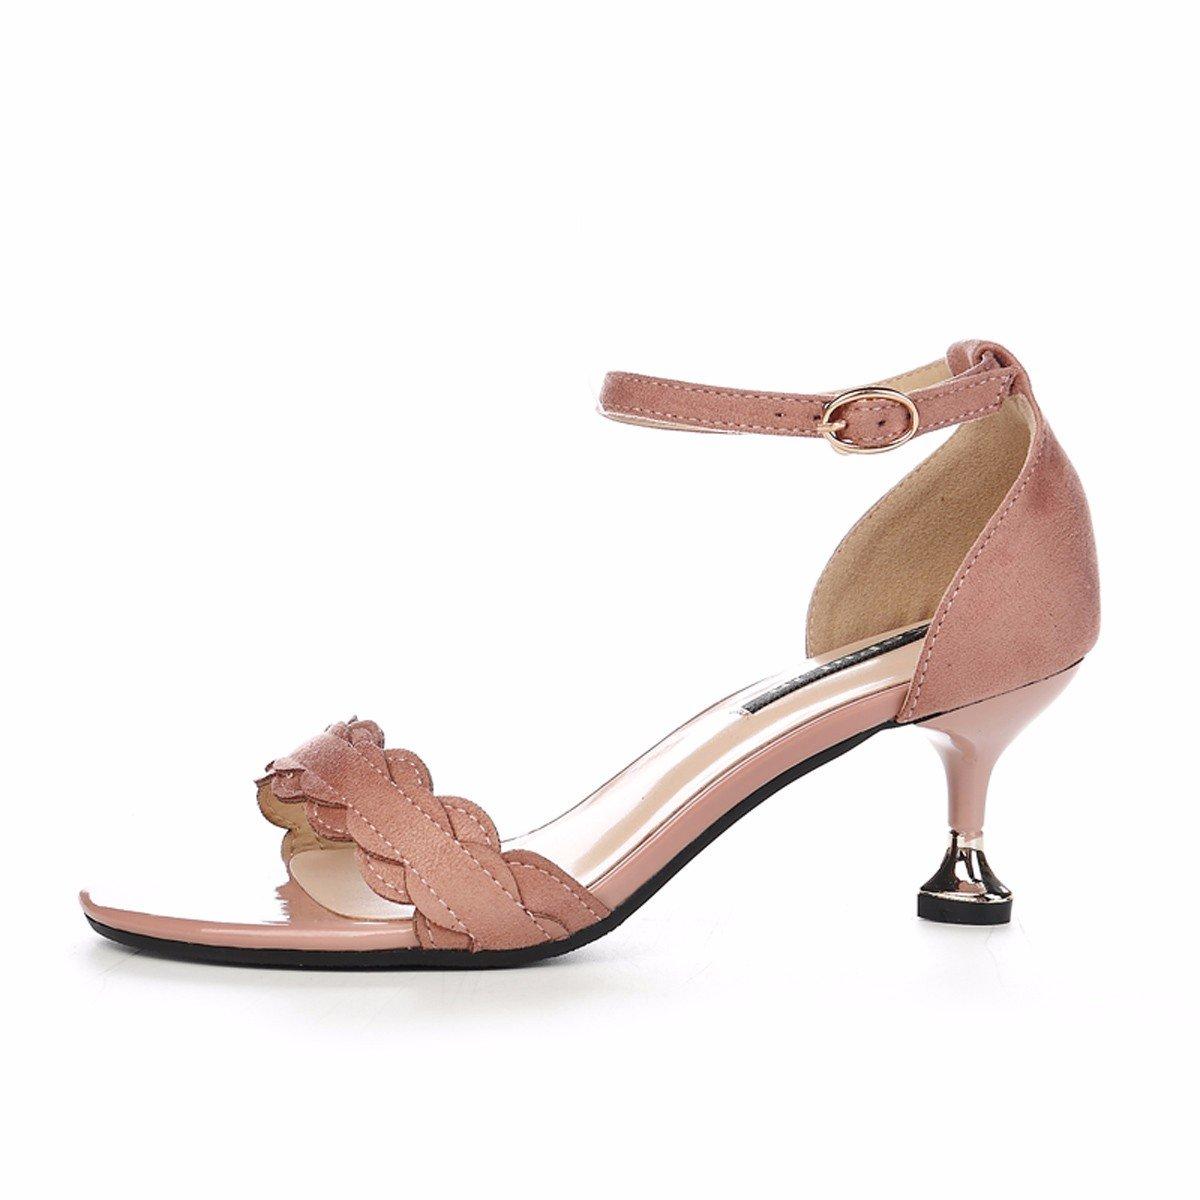 GTVERNH GTVERNH GTVERNH Damenschuhe Weiblich Sommer Nahe Bei 6 cm Hochhackigen Schuhe Dünne Sohle Wild Gürtel Wort Gürtel Cat - Schuhe fbfcac